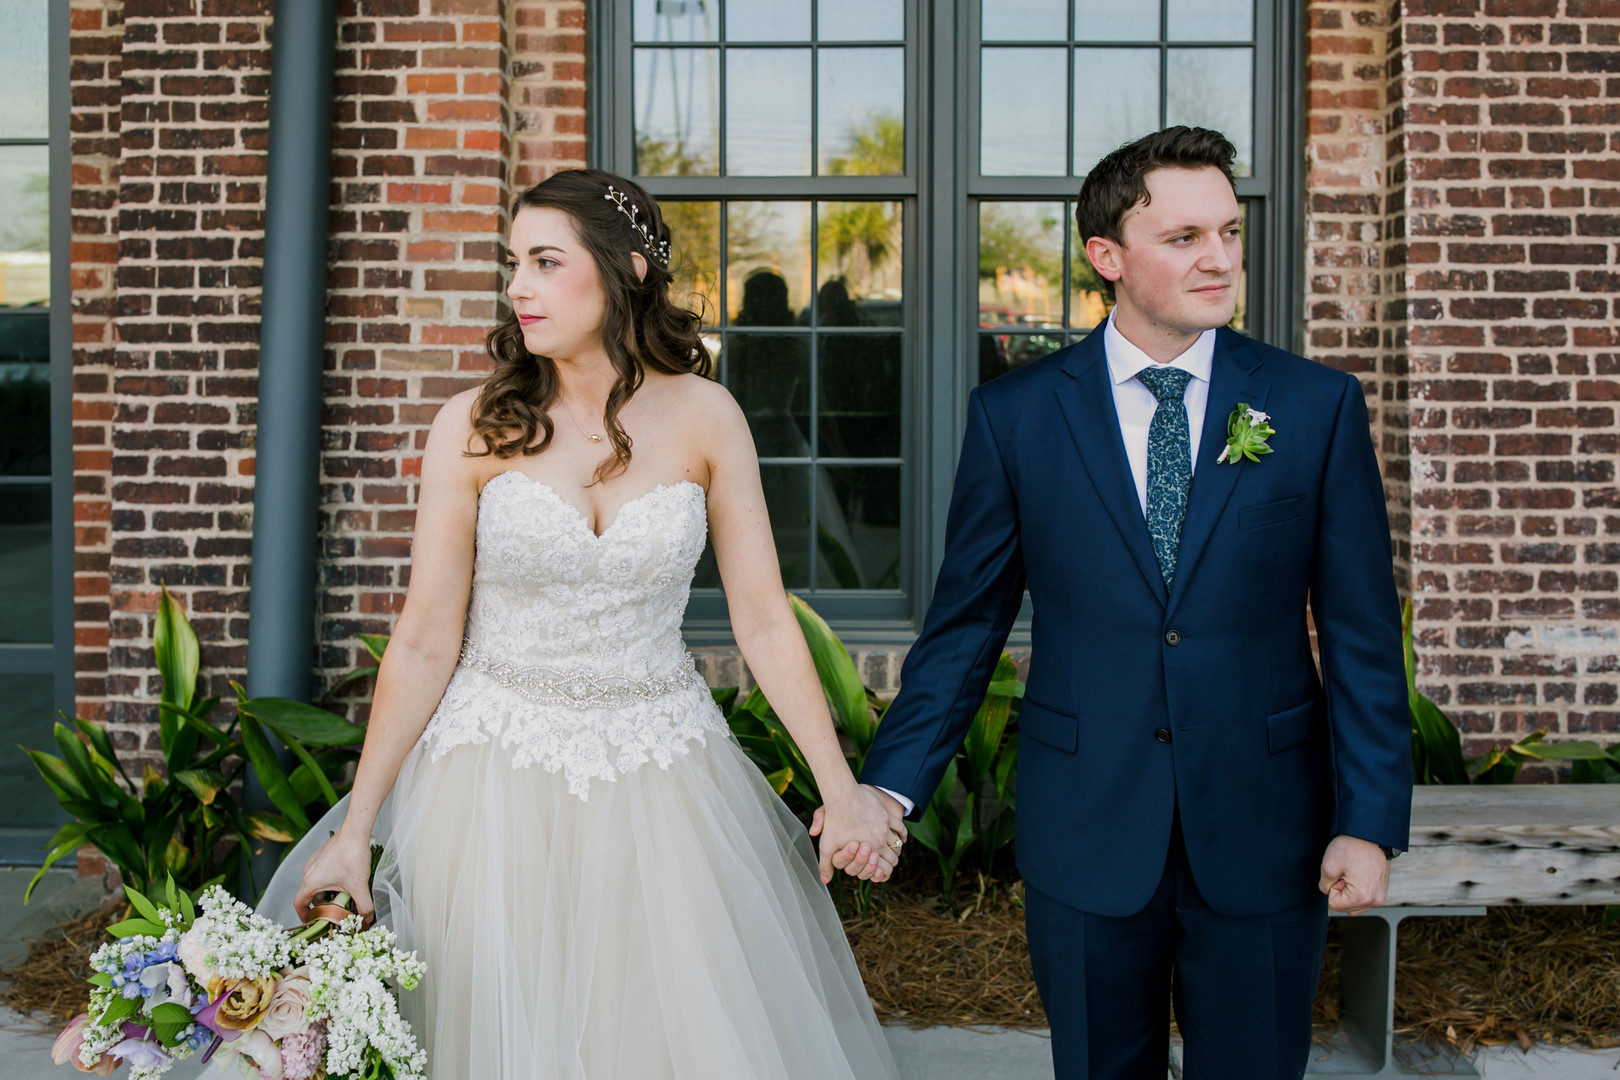 cedar-room-wedding-25.jpg